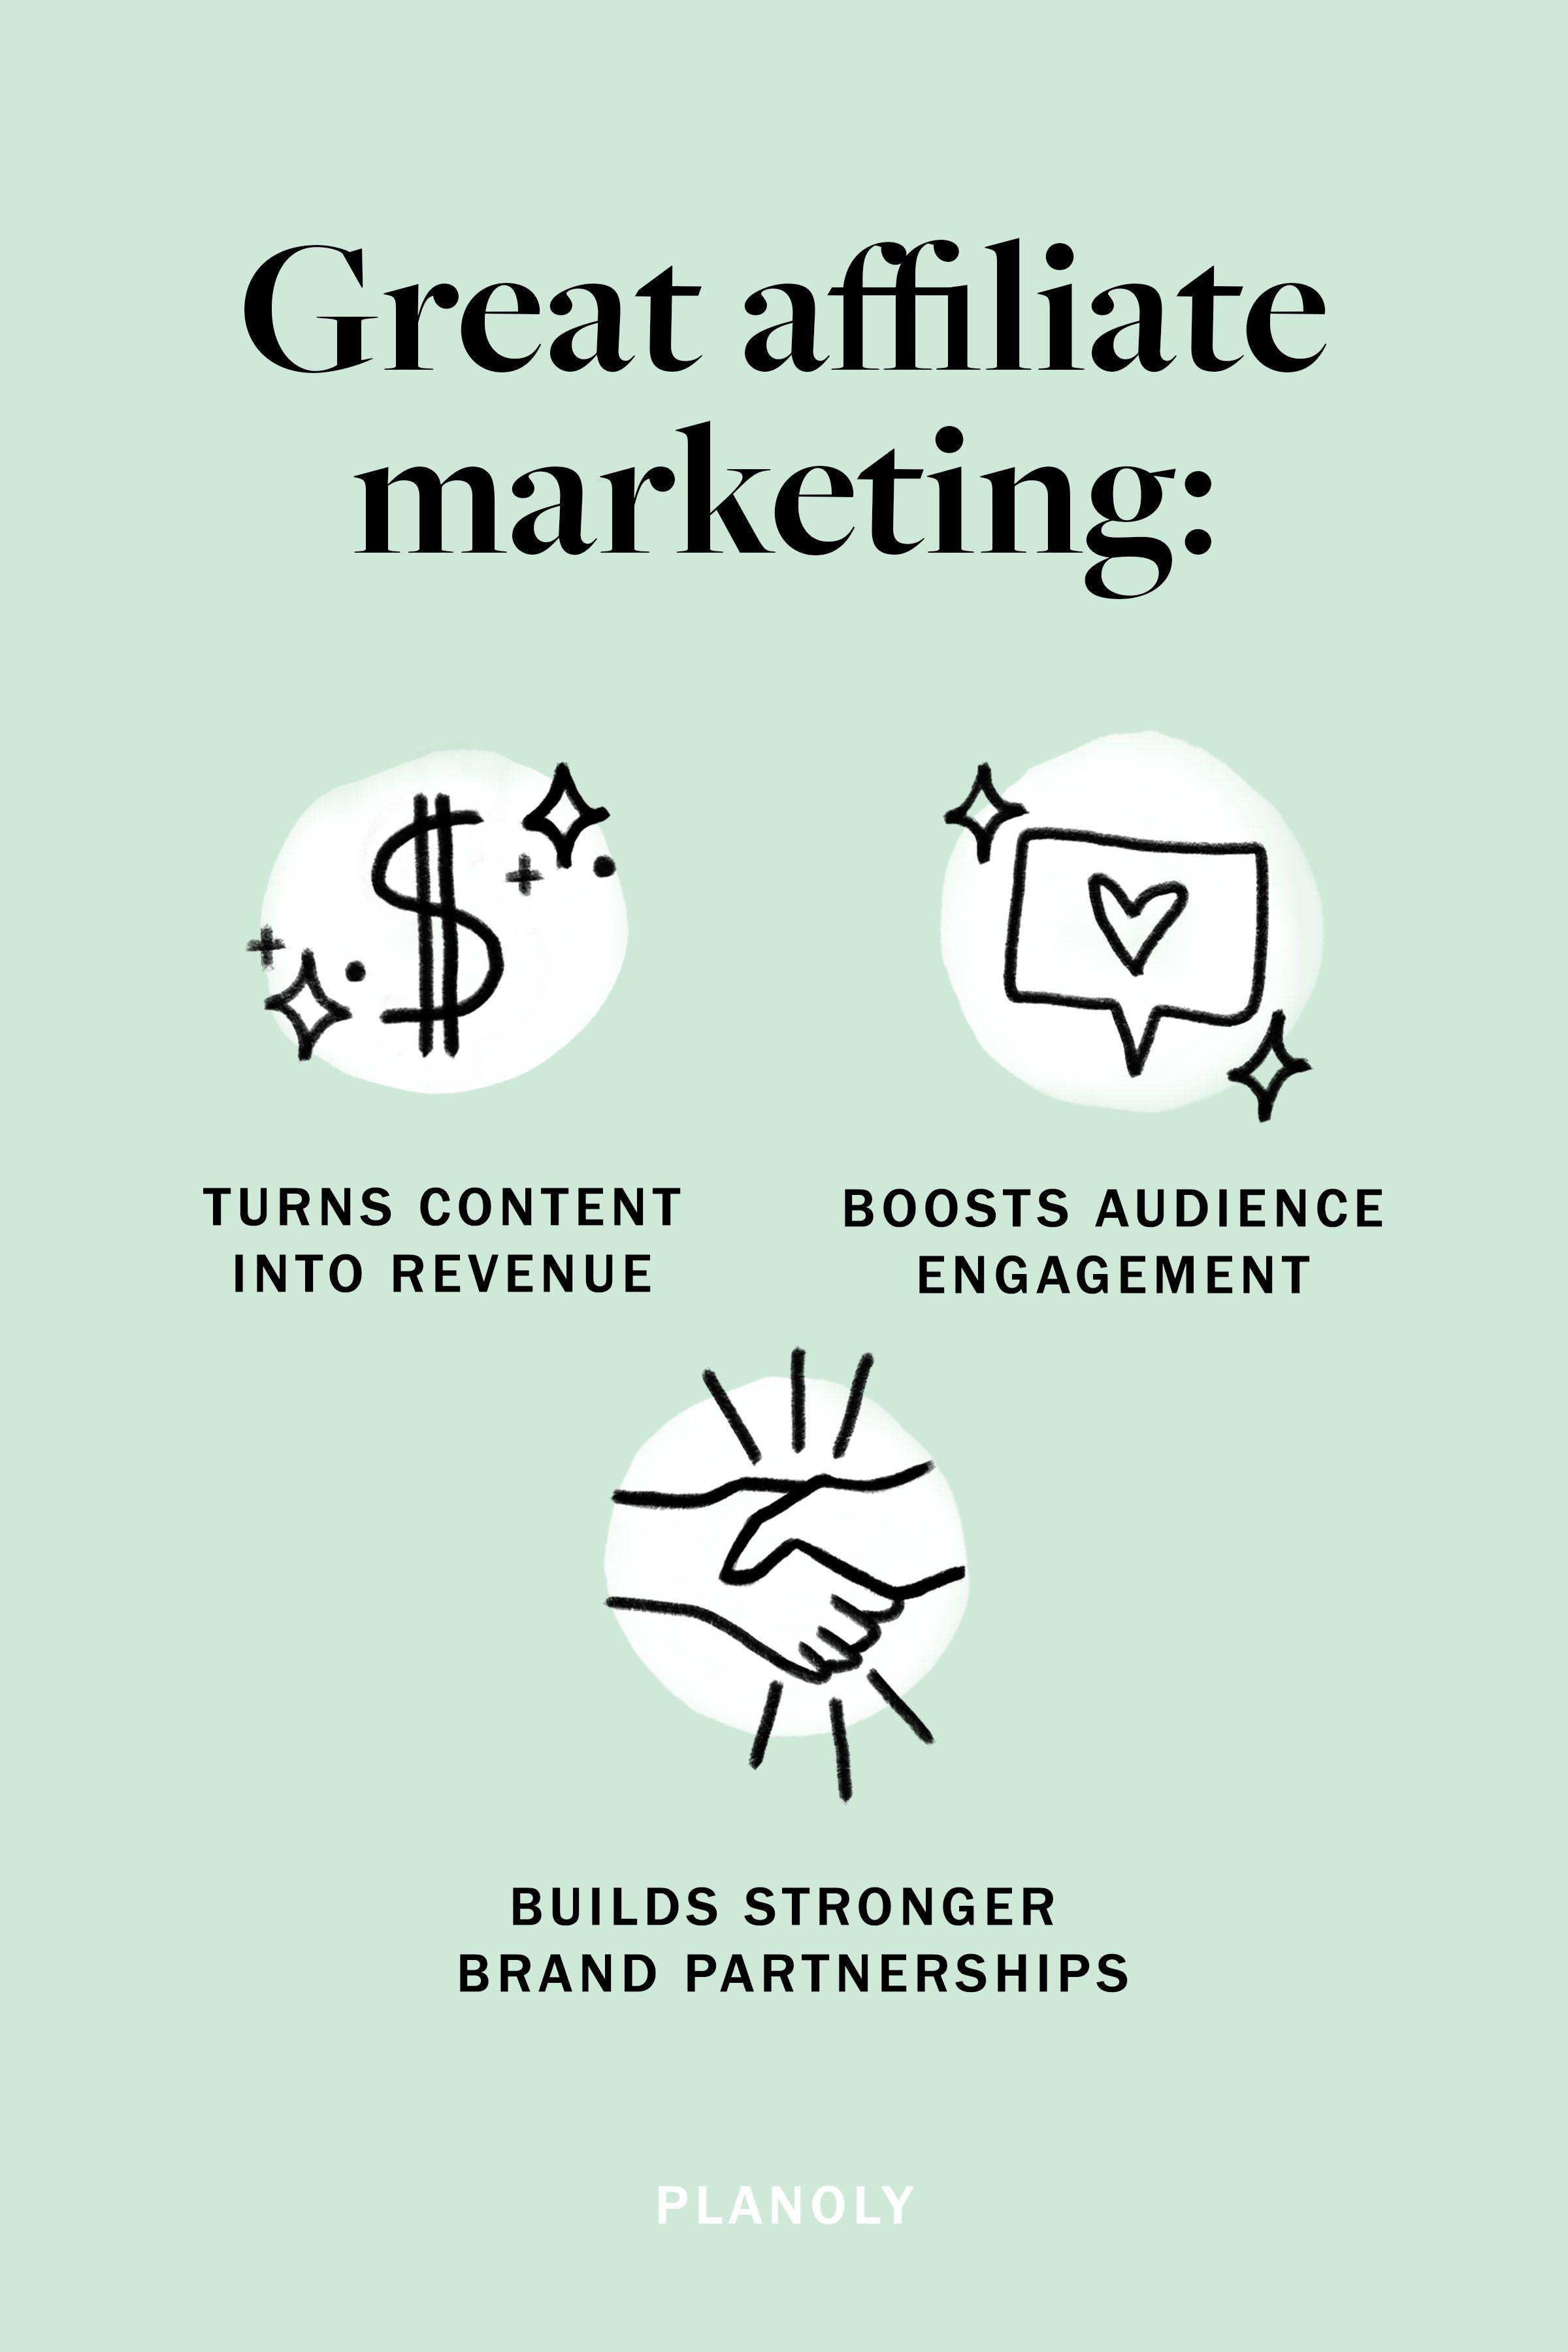 PLANOLY-Blog Post-Affiliate Marketing Benefits-Image1